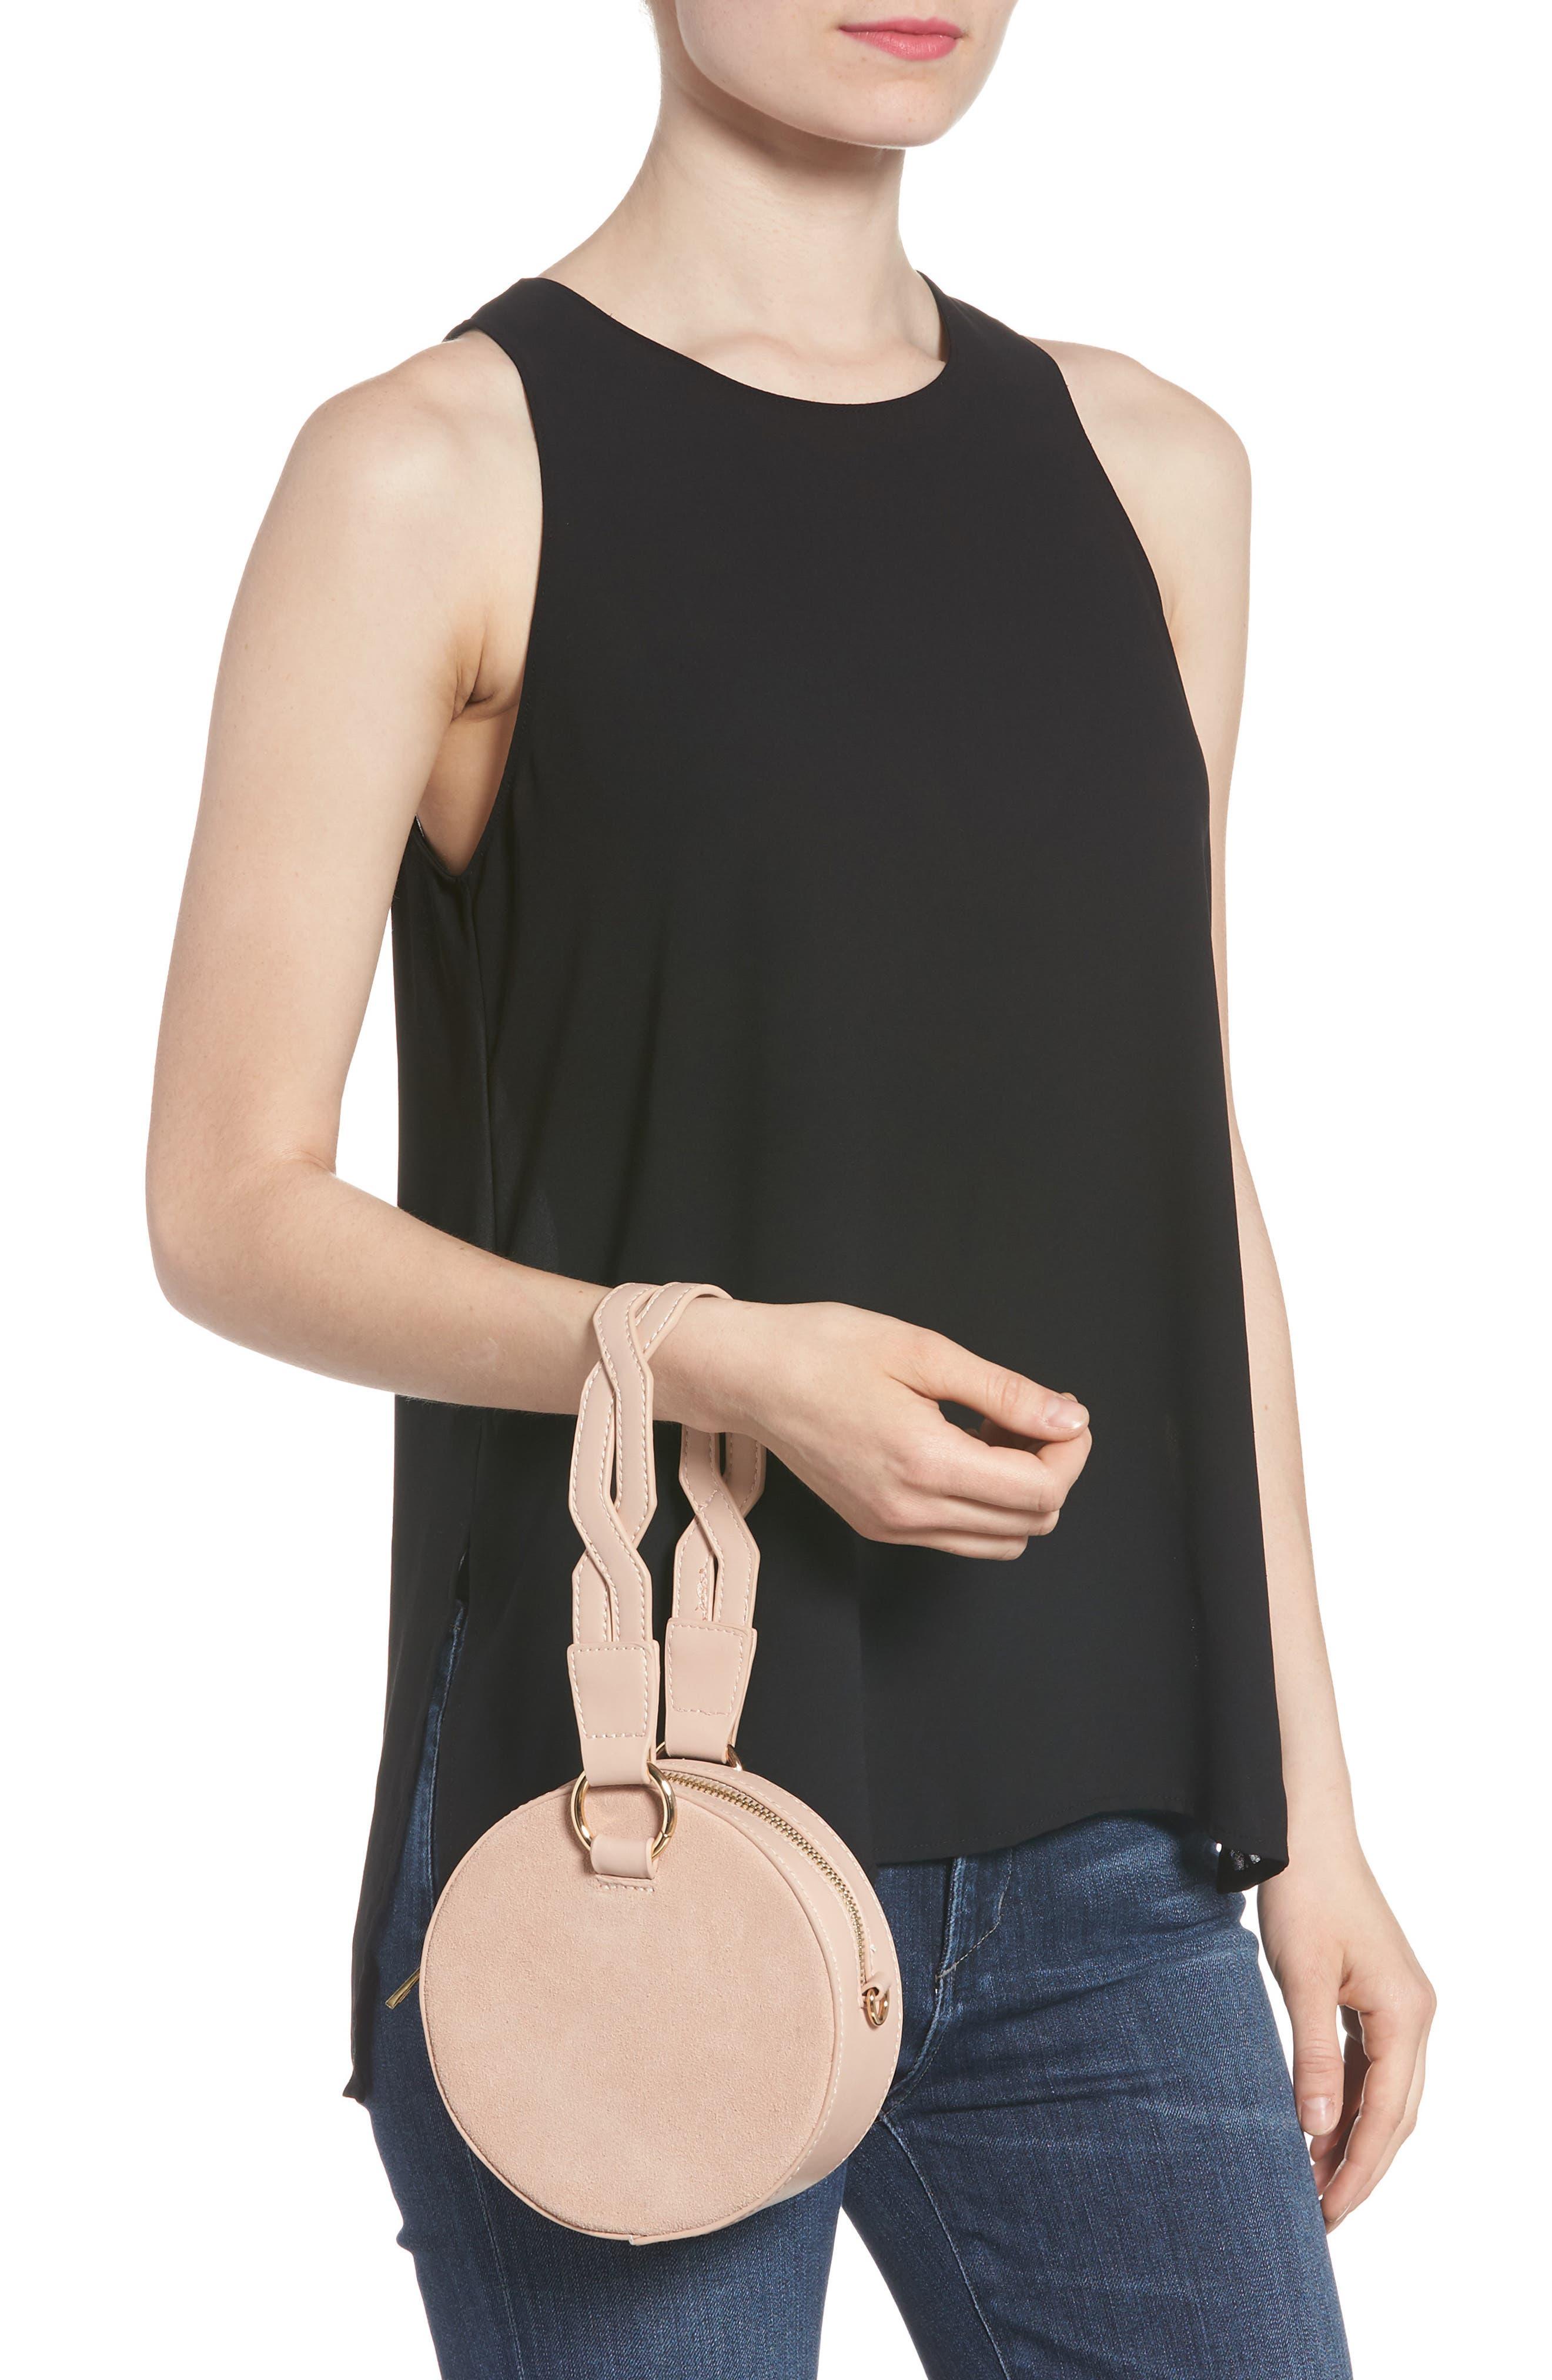 Circle Bag with Wristlet,                             Alternate thumbnail 2, color,                             Tan